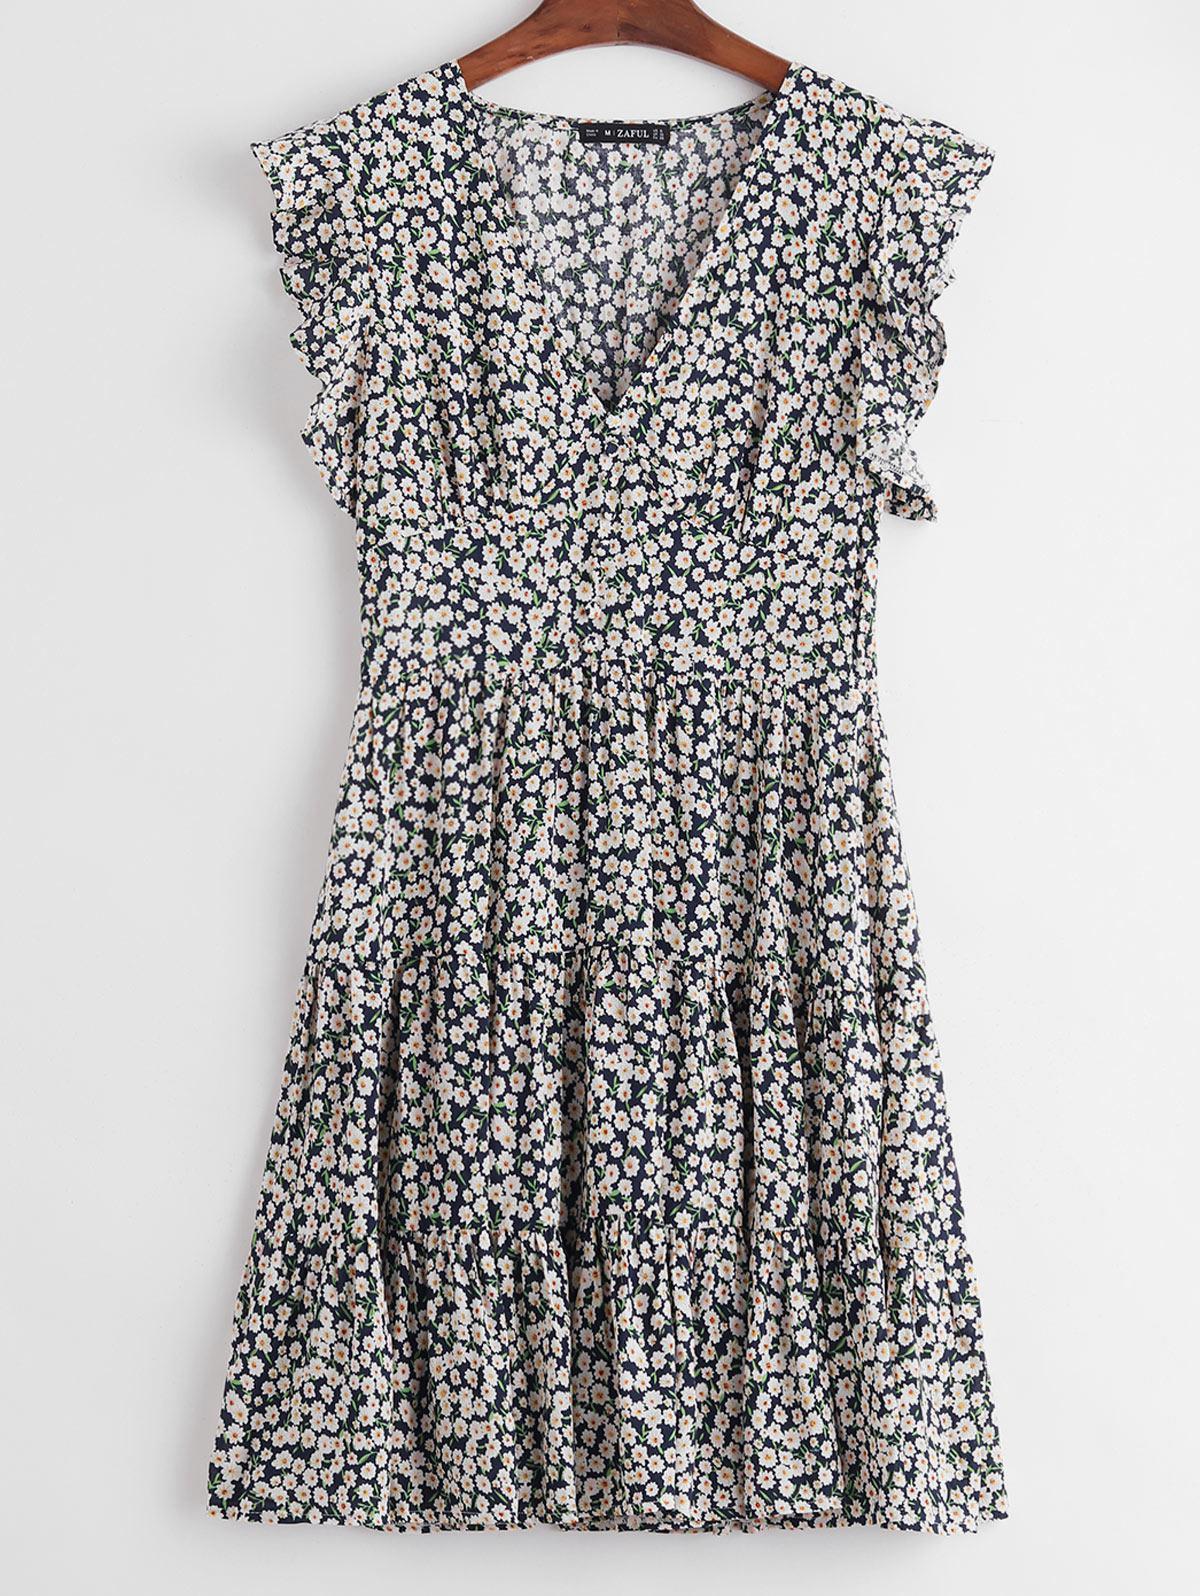 ZAFUL Ditsy Floral Ruffle Armhole Flounce Dress фото